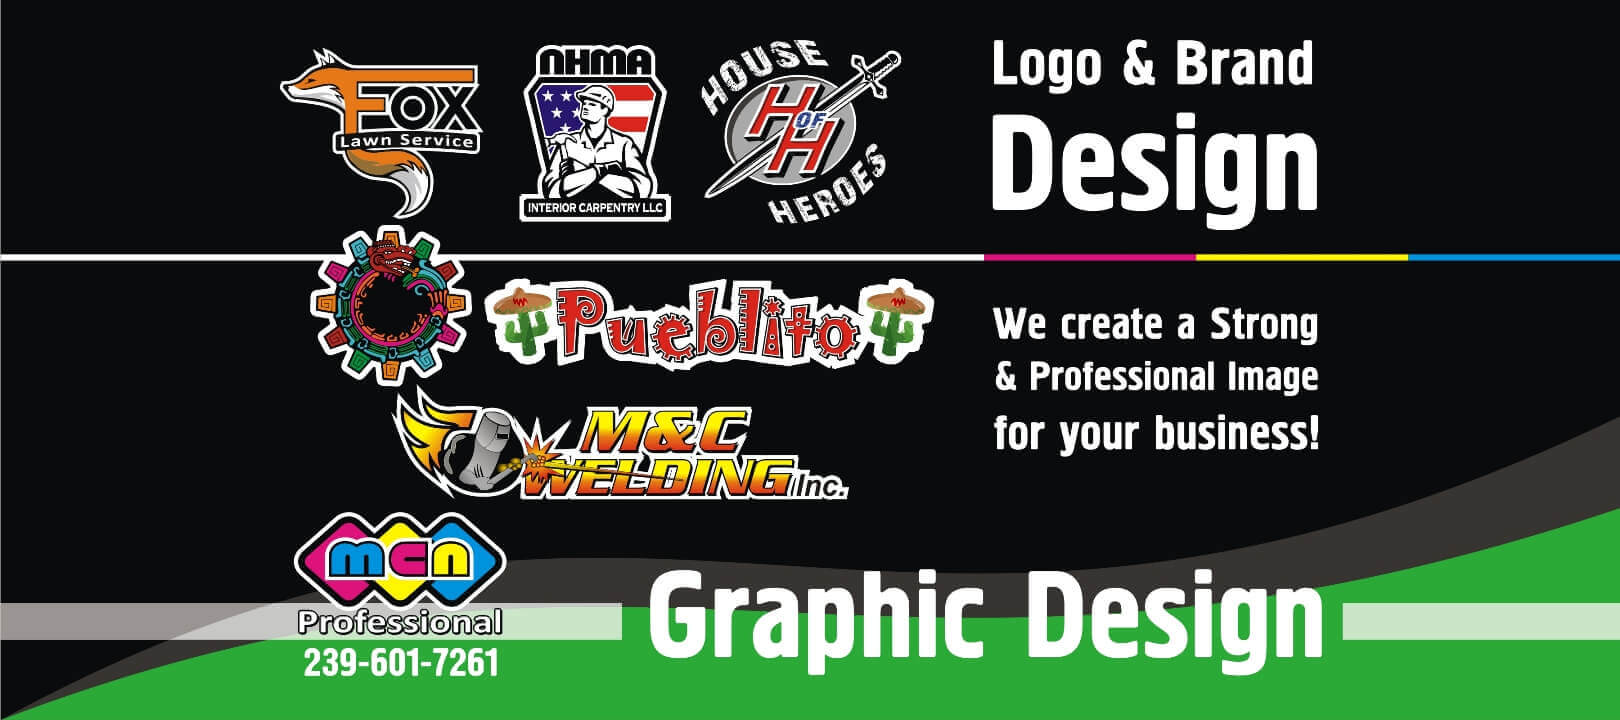 F Logo brand Design